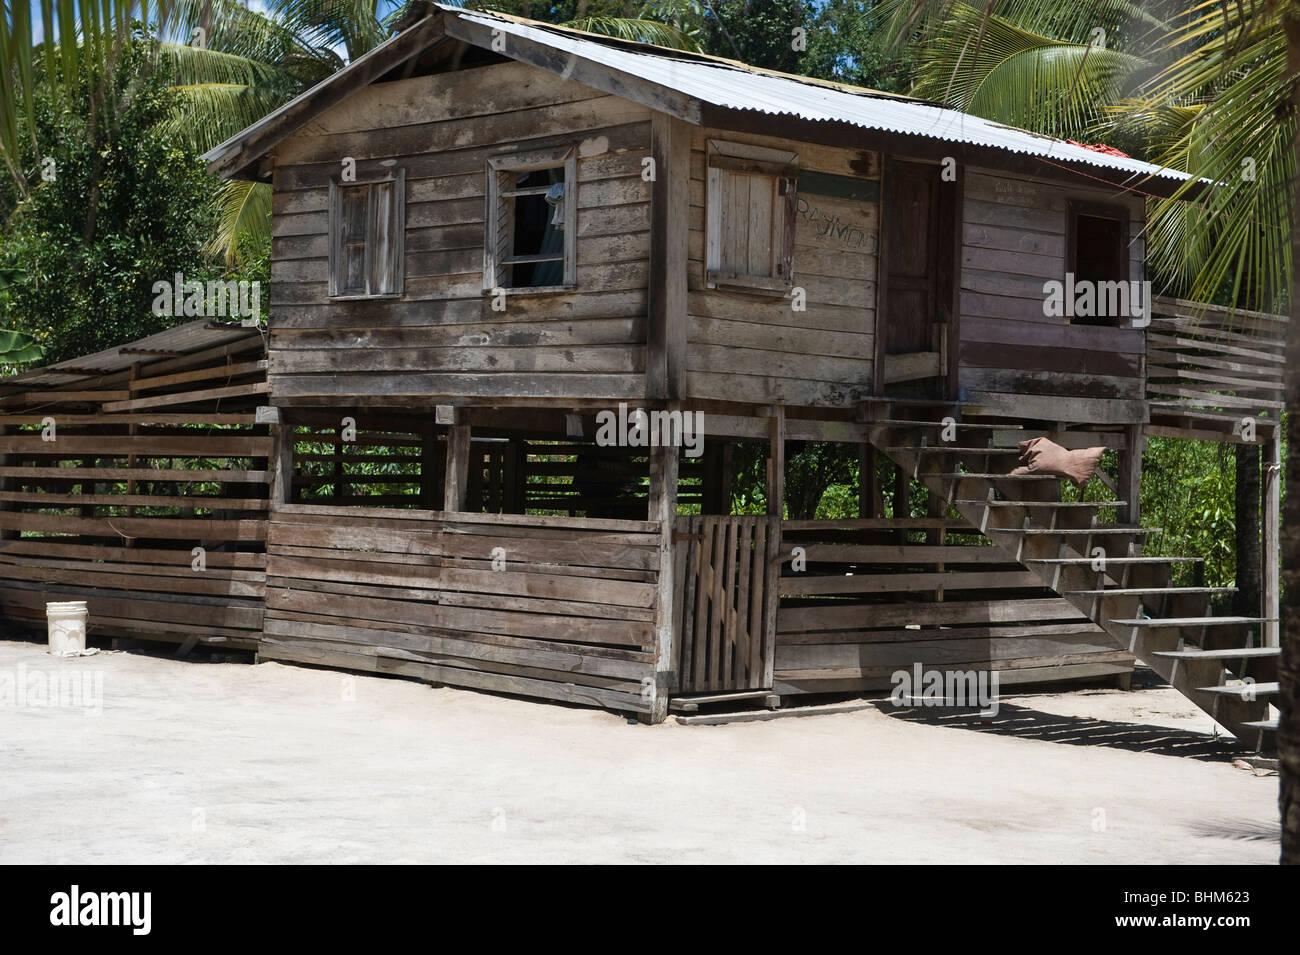 Building in Fair View Village, Kurupukari, Iwokrama Rainforest Guiana Shield Guyana South America October - Stock Image